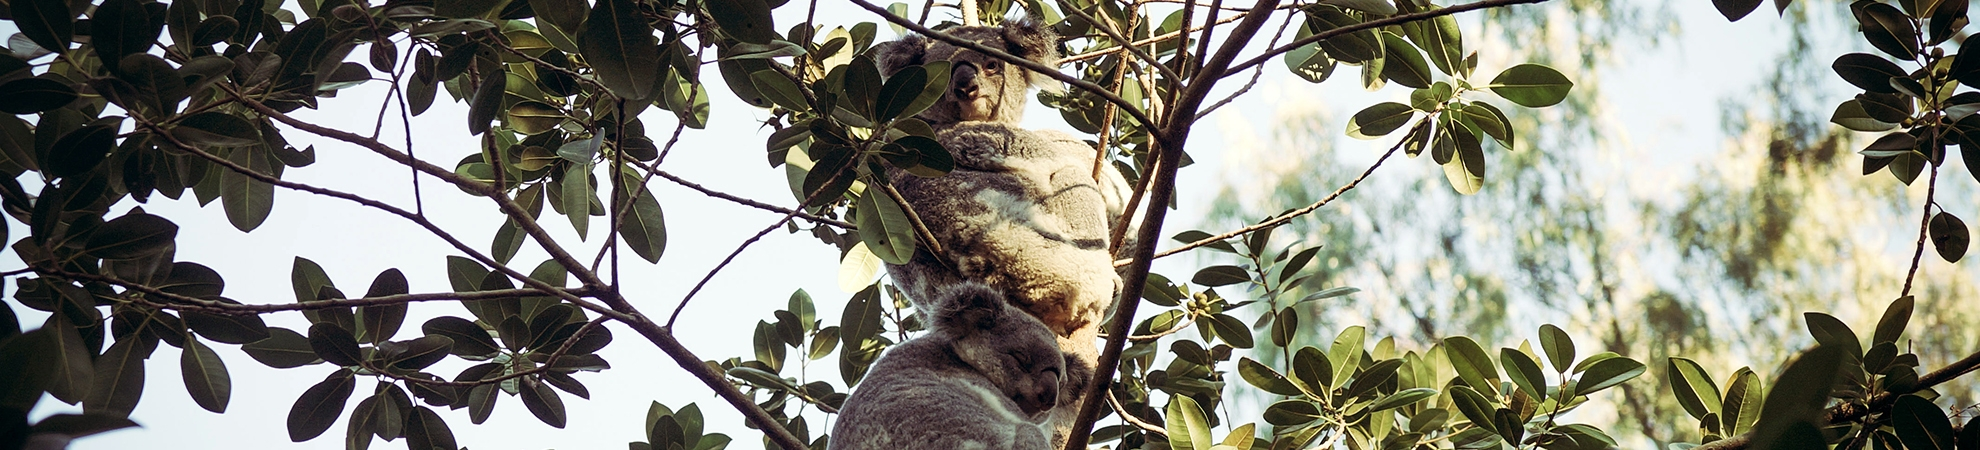 Séjour Australie